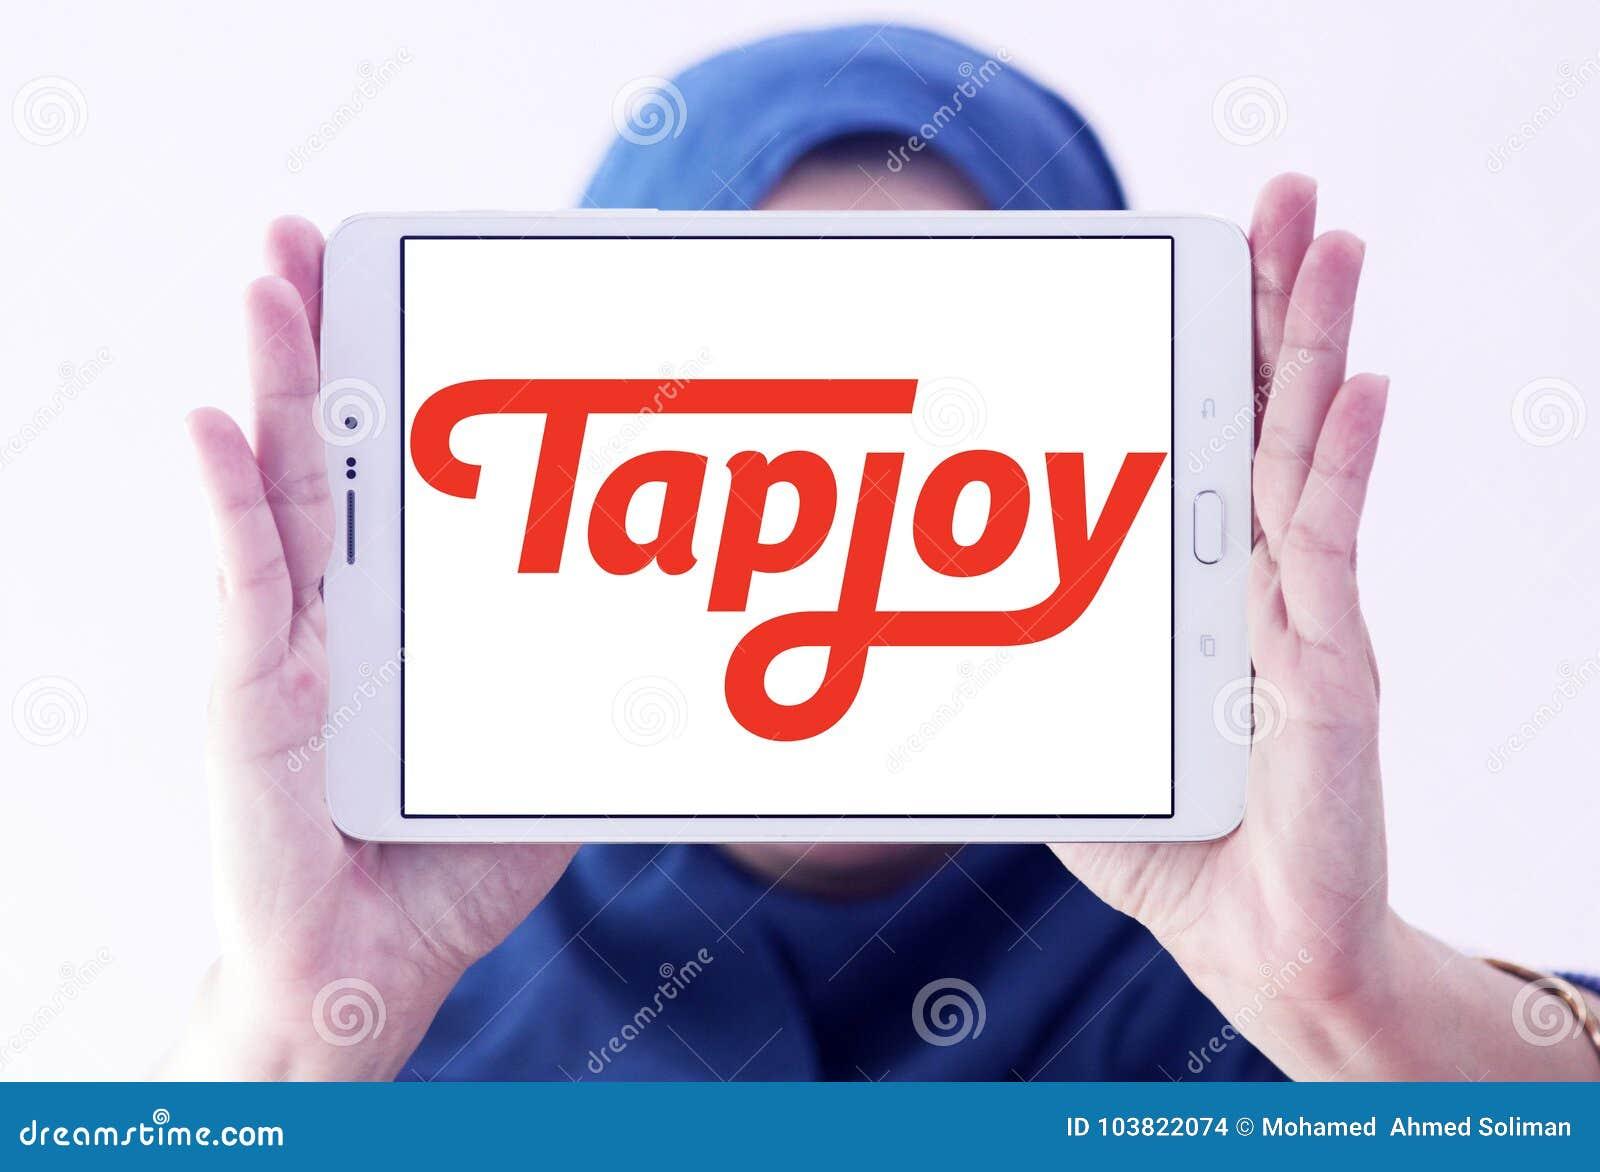 Tapjoy company logo editorial stock image  Image of